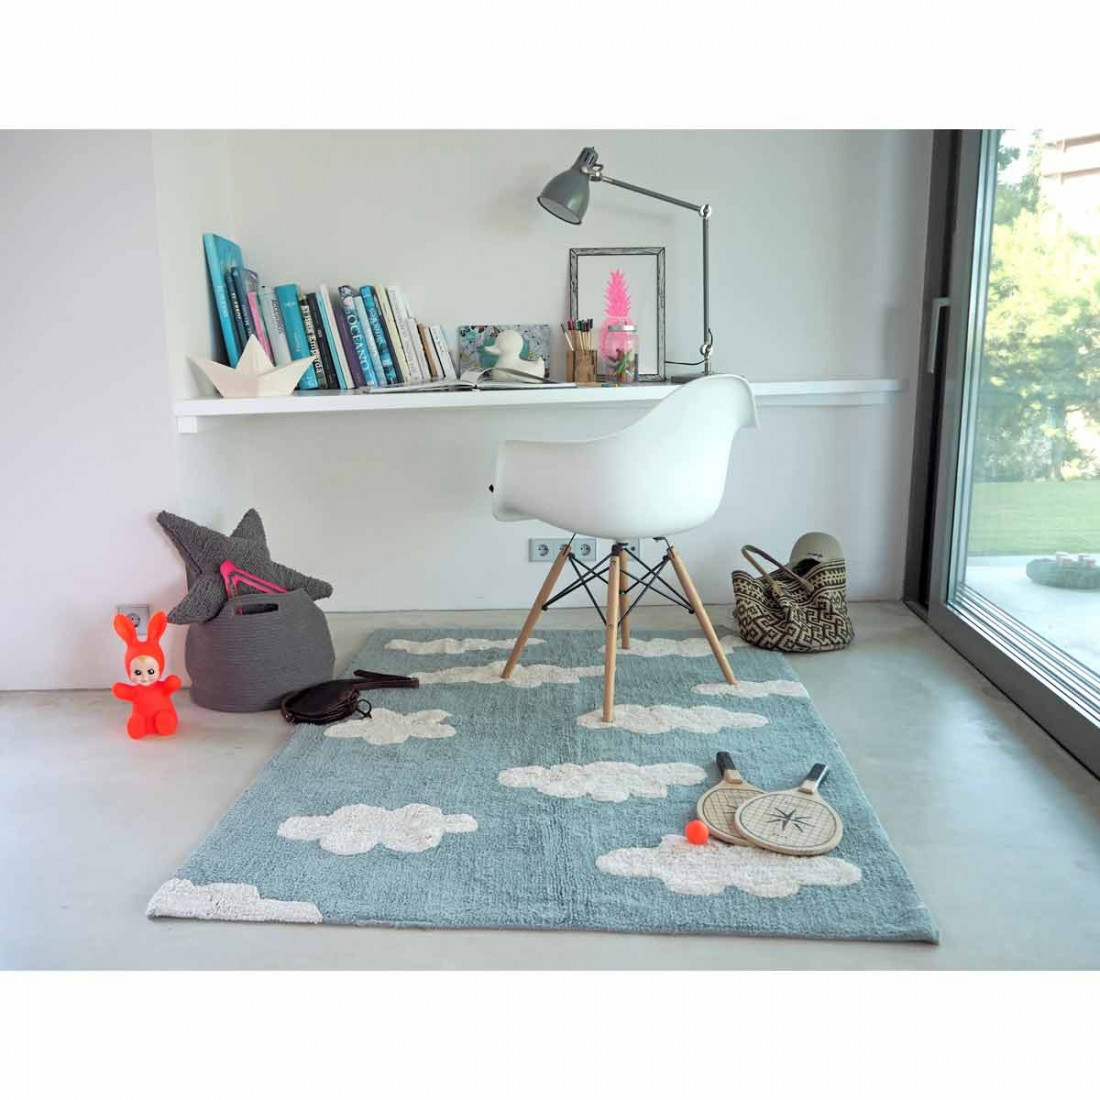 tapis nuage bleu crer with tapis nuage bleu excellent. Black Bedroom Furniture Sets. Home Design Ideas